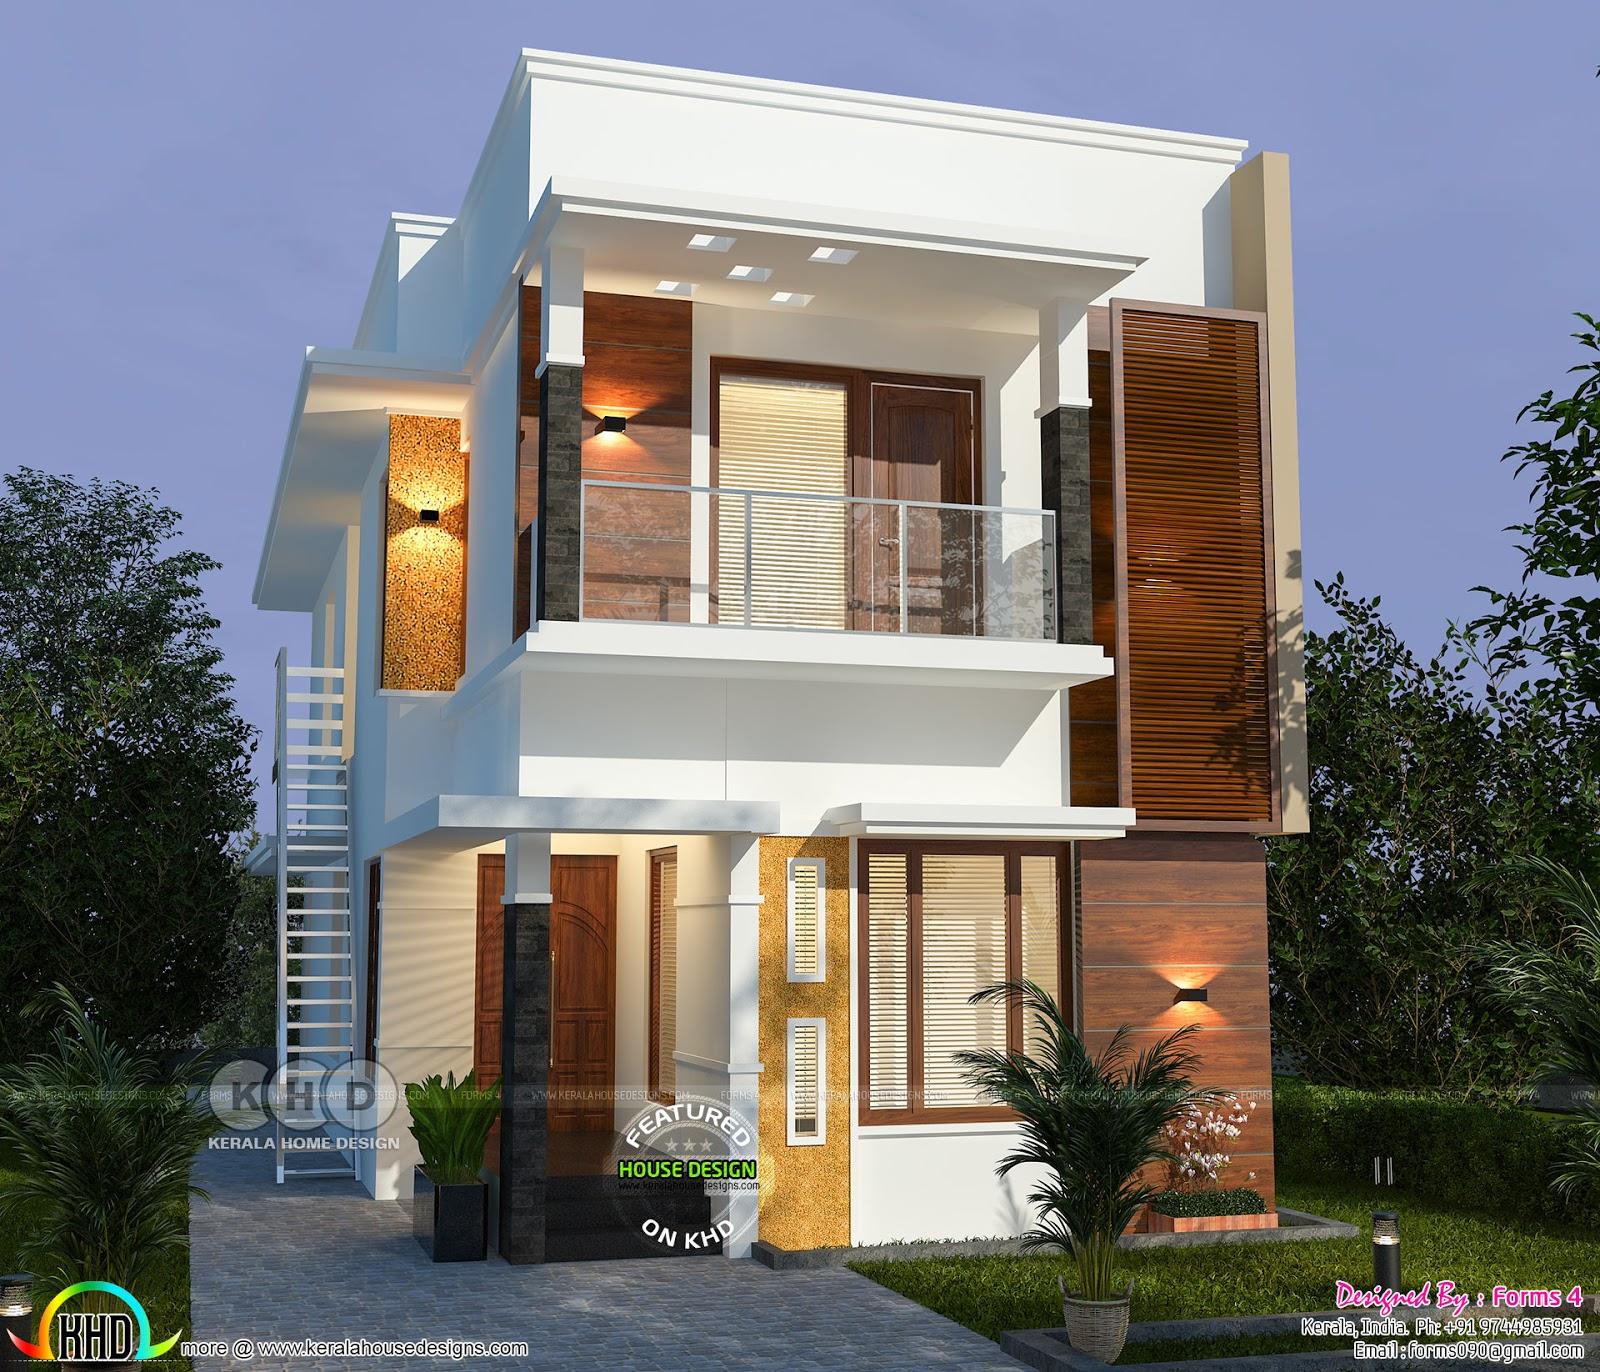 25 Lakhs Cost Estimated 5 Bedroom Home Kerala Home